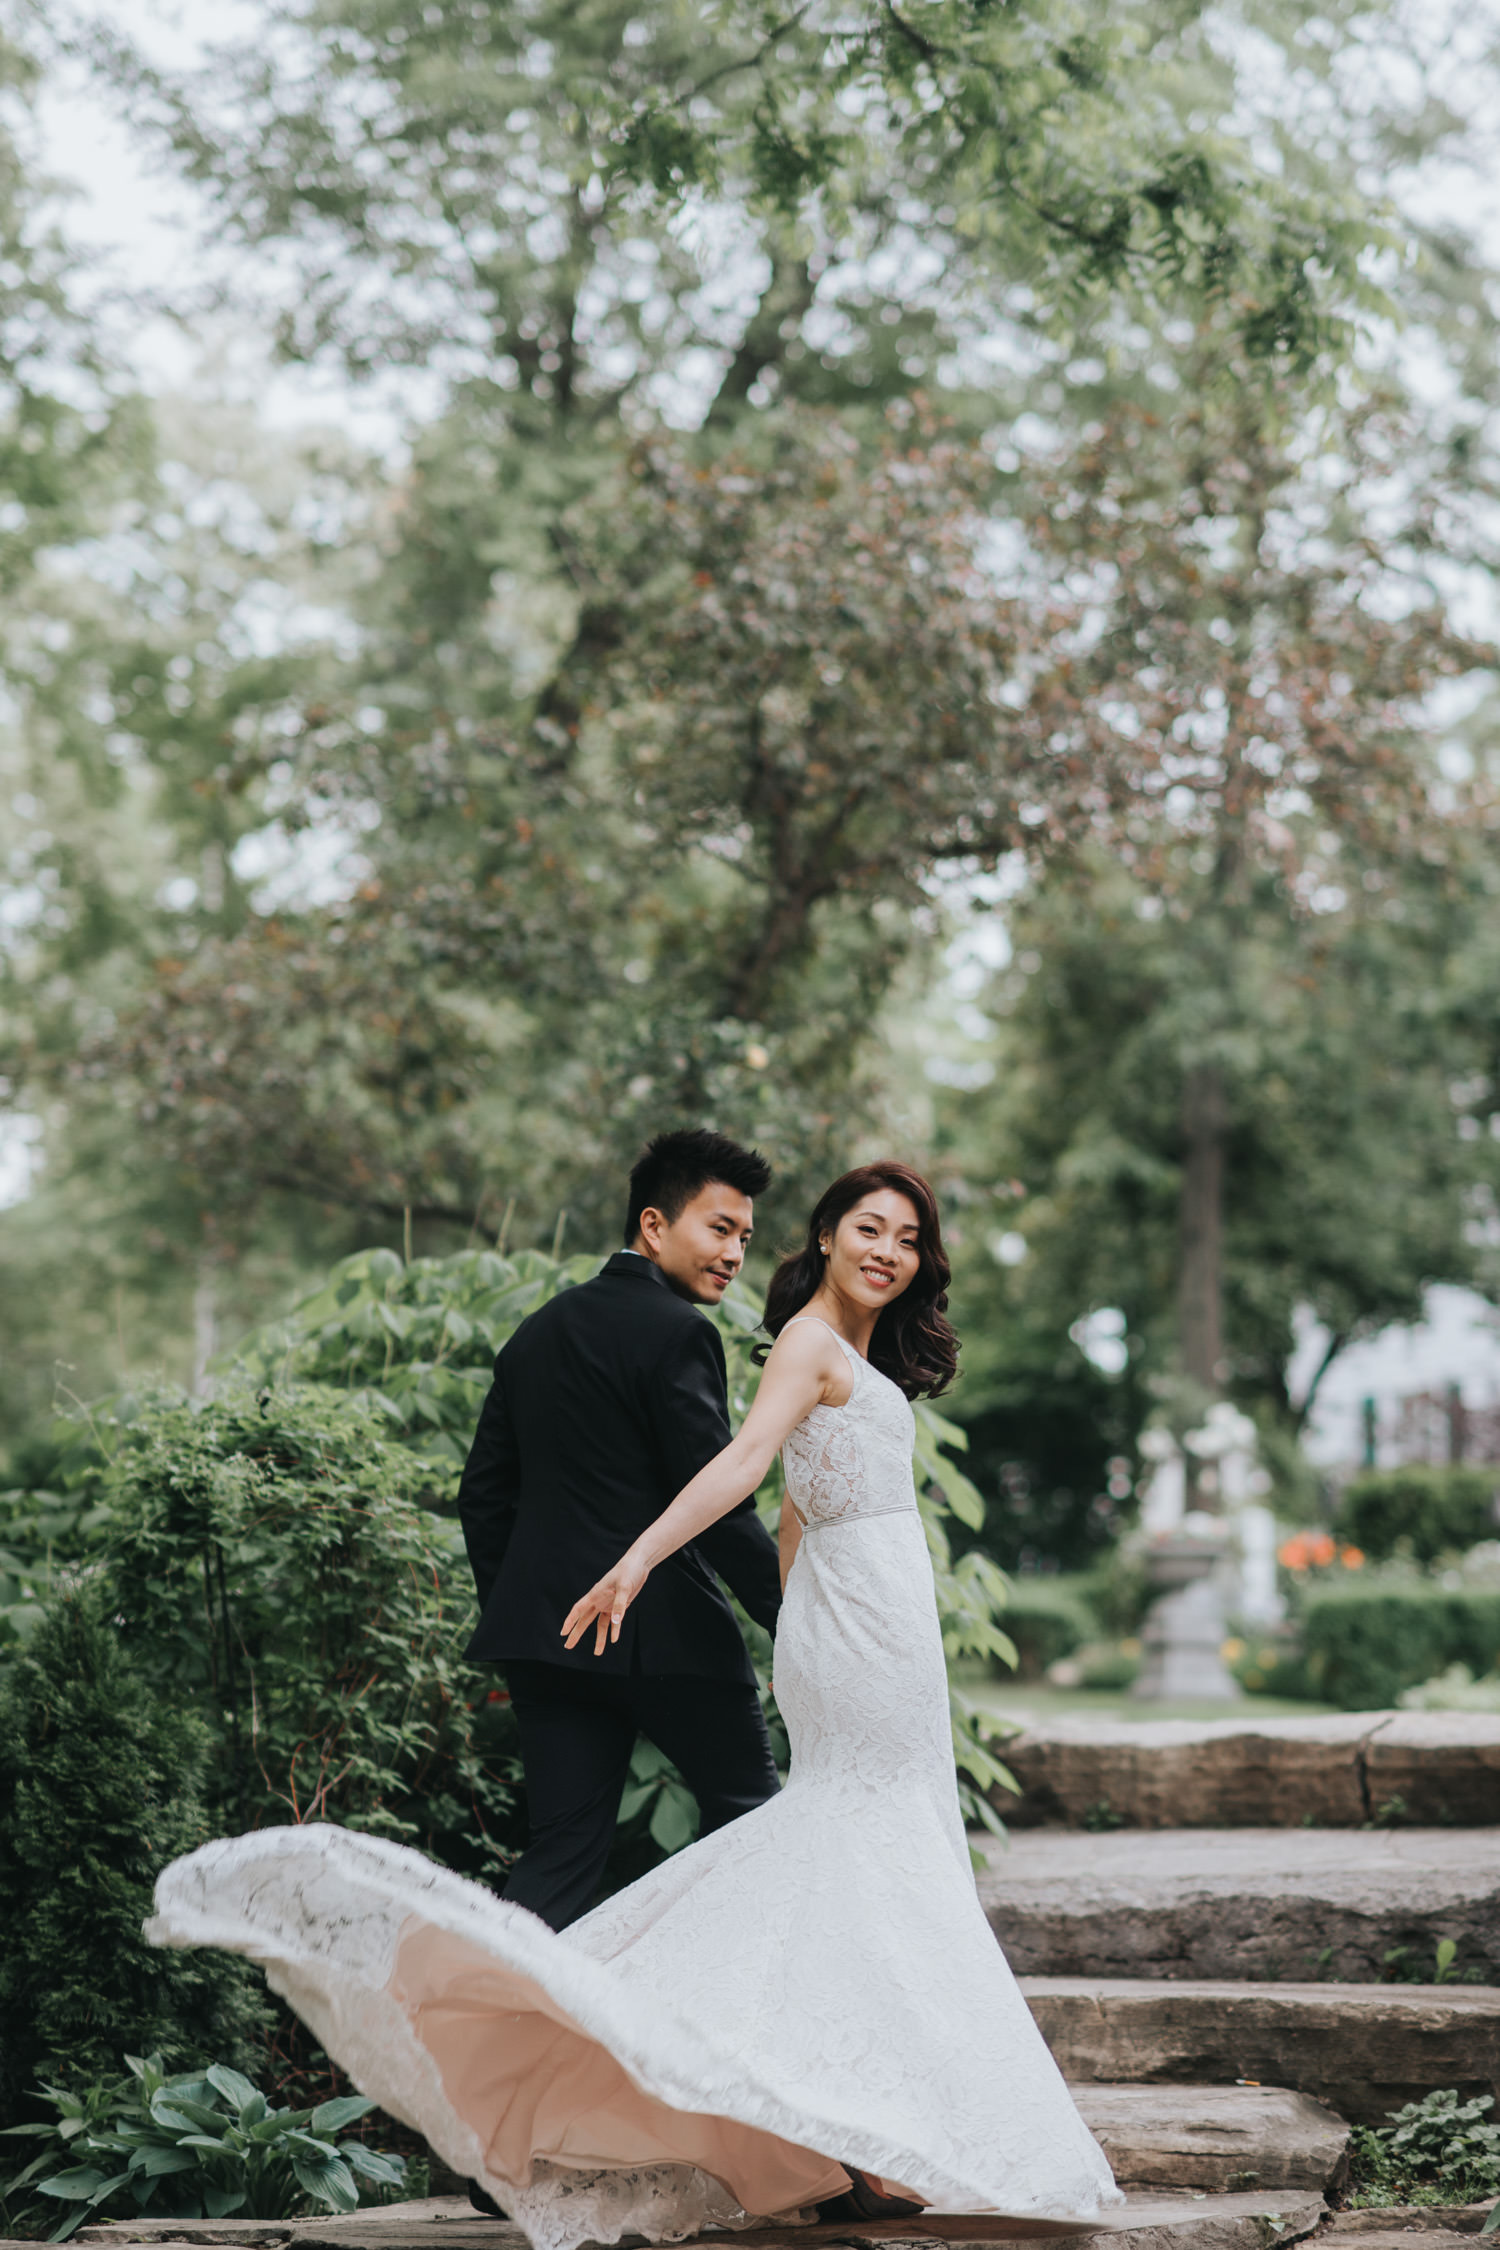 Doctor's House wedding ceremony outdoor portrait wedding dress